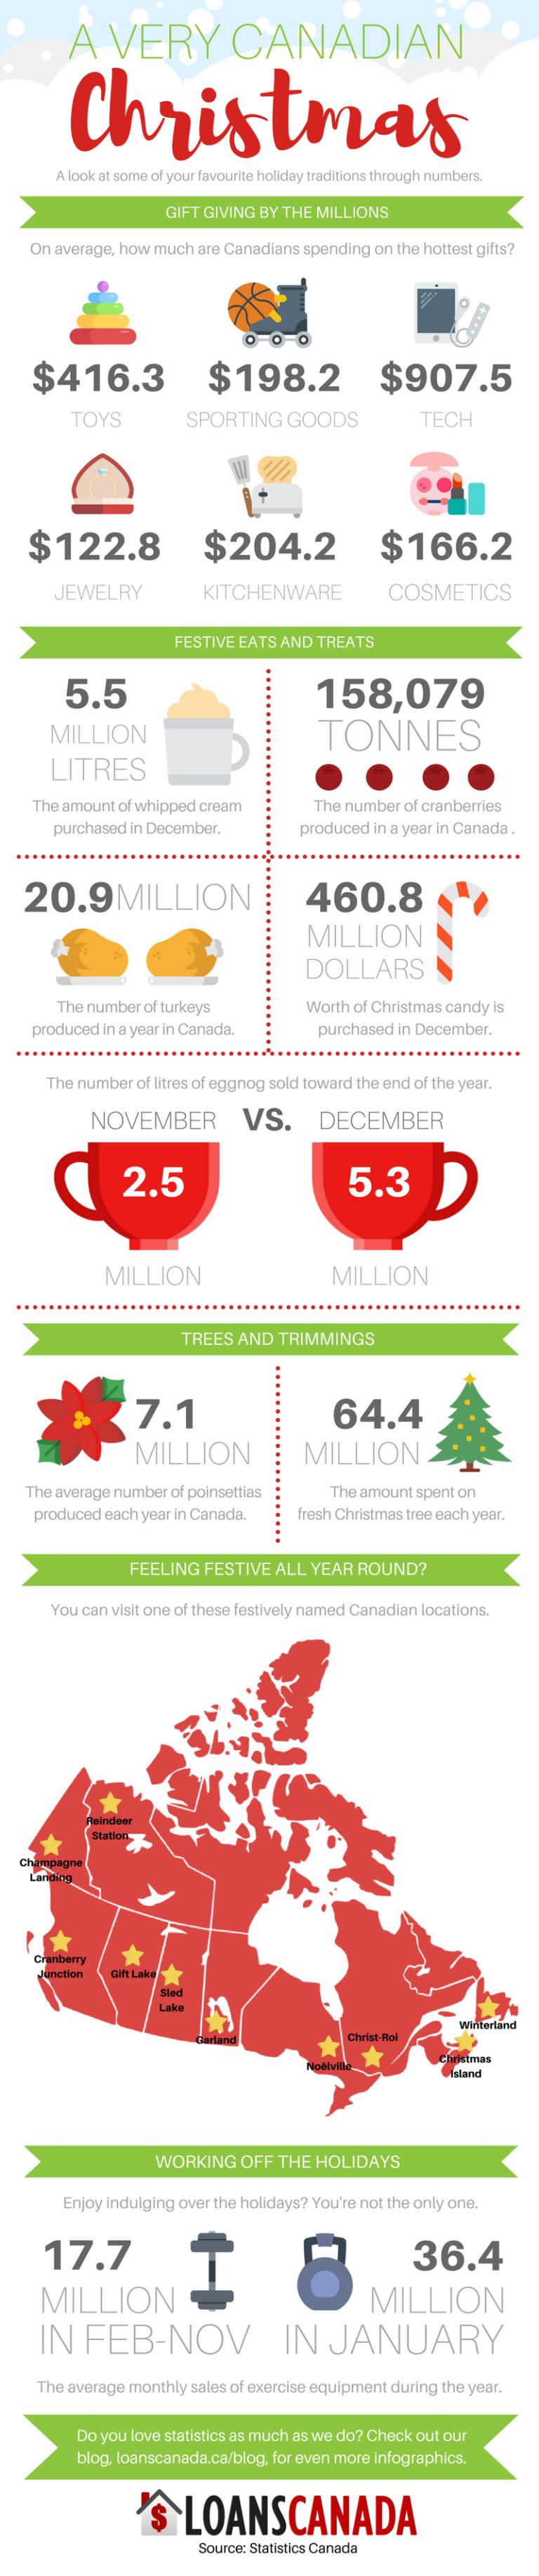 Canadian Christmas statistics